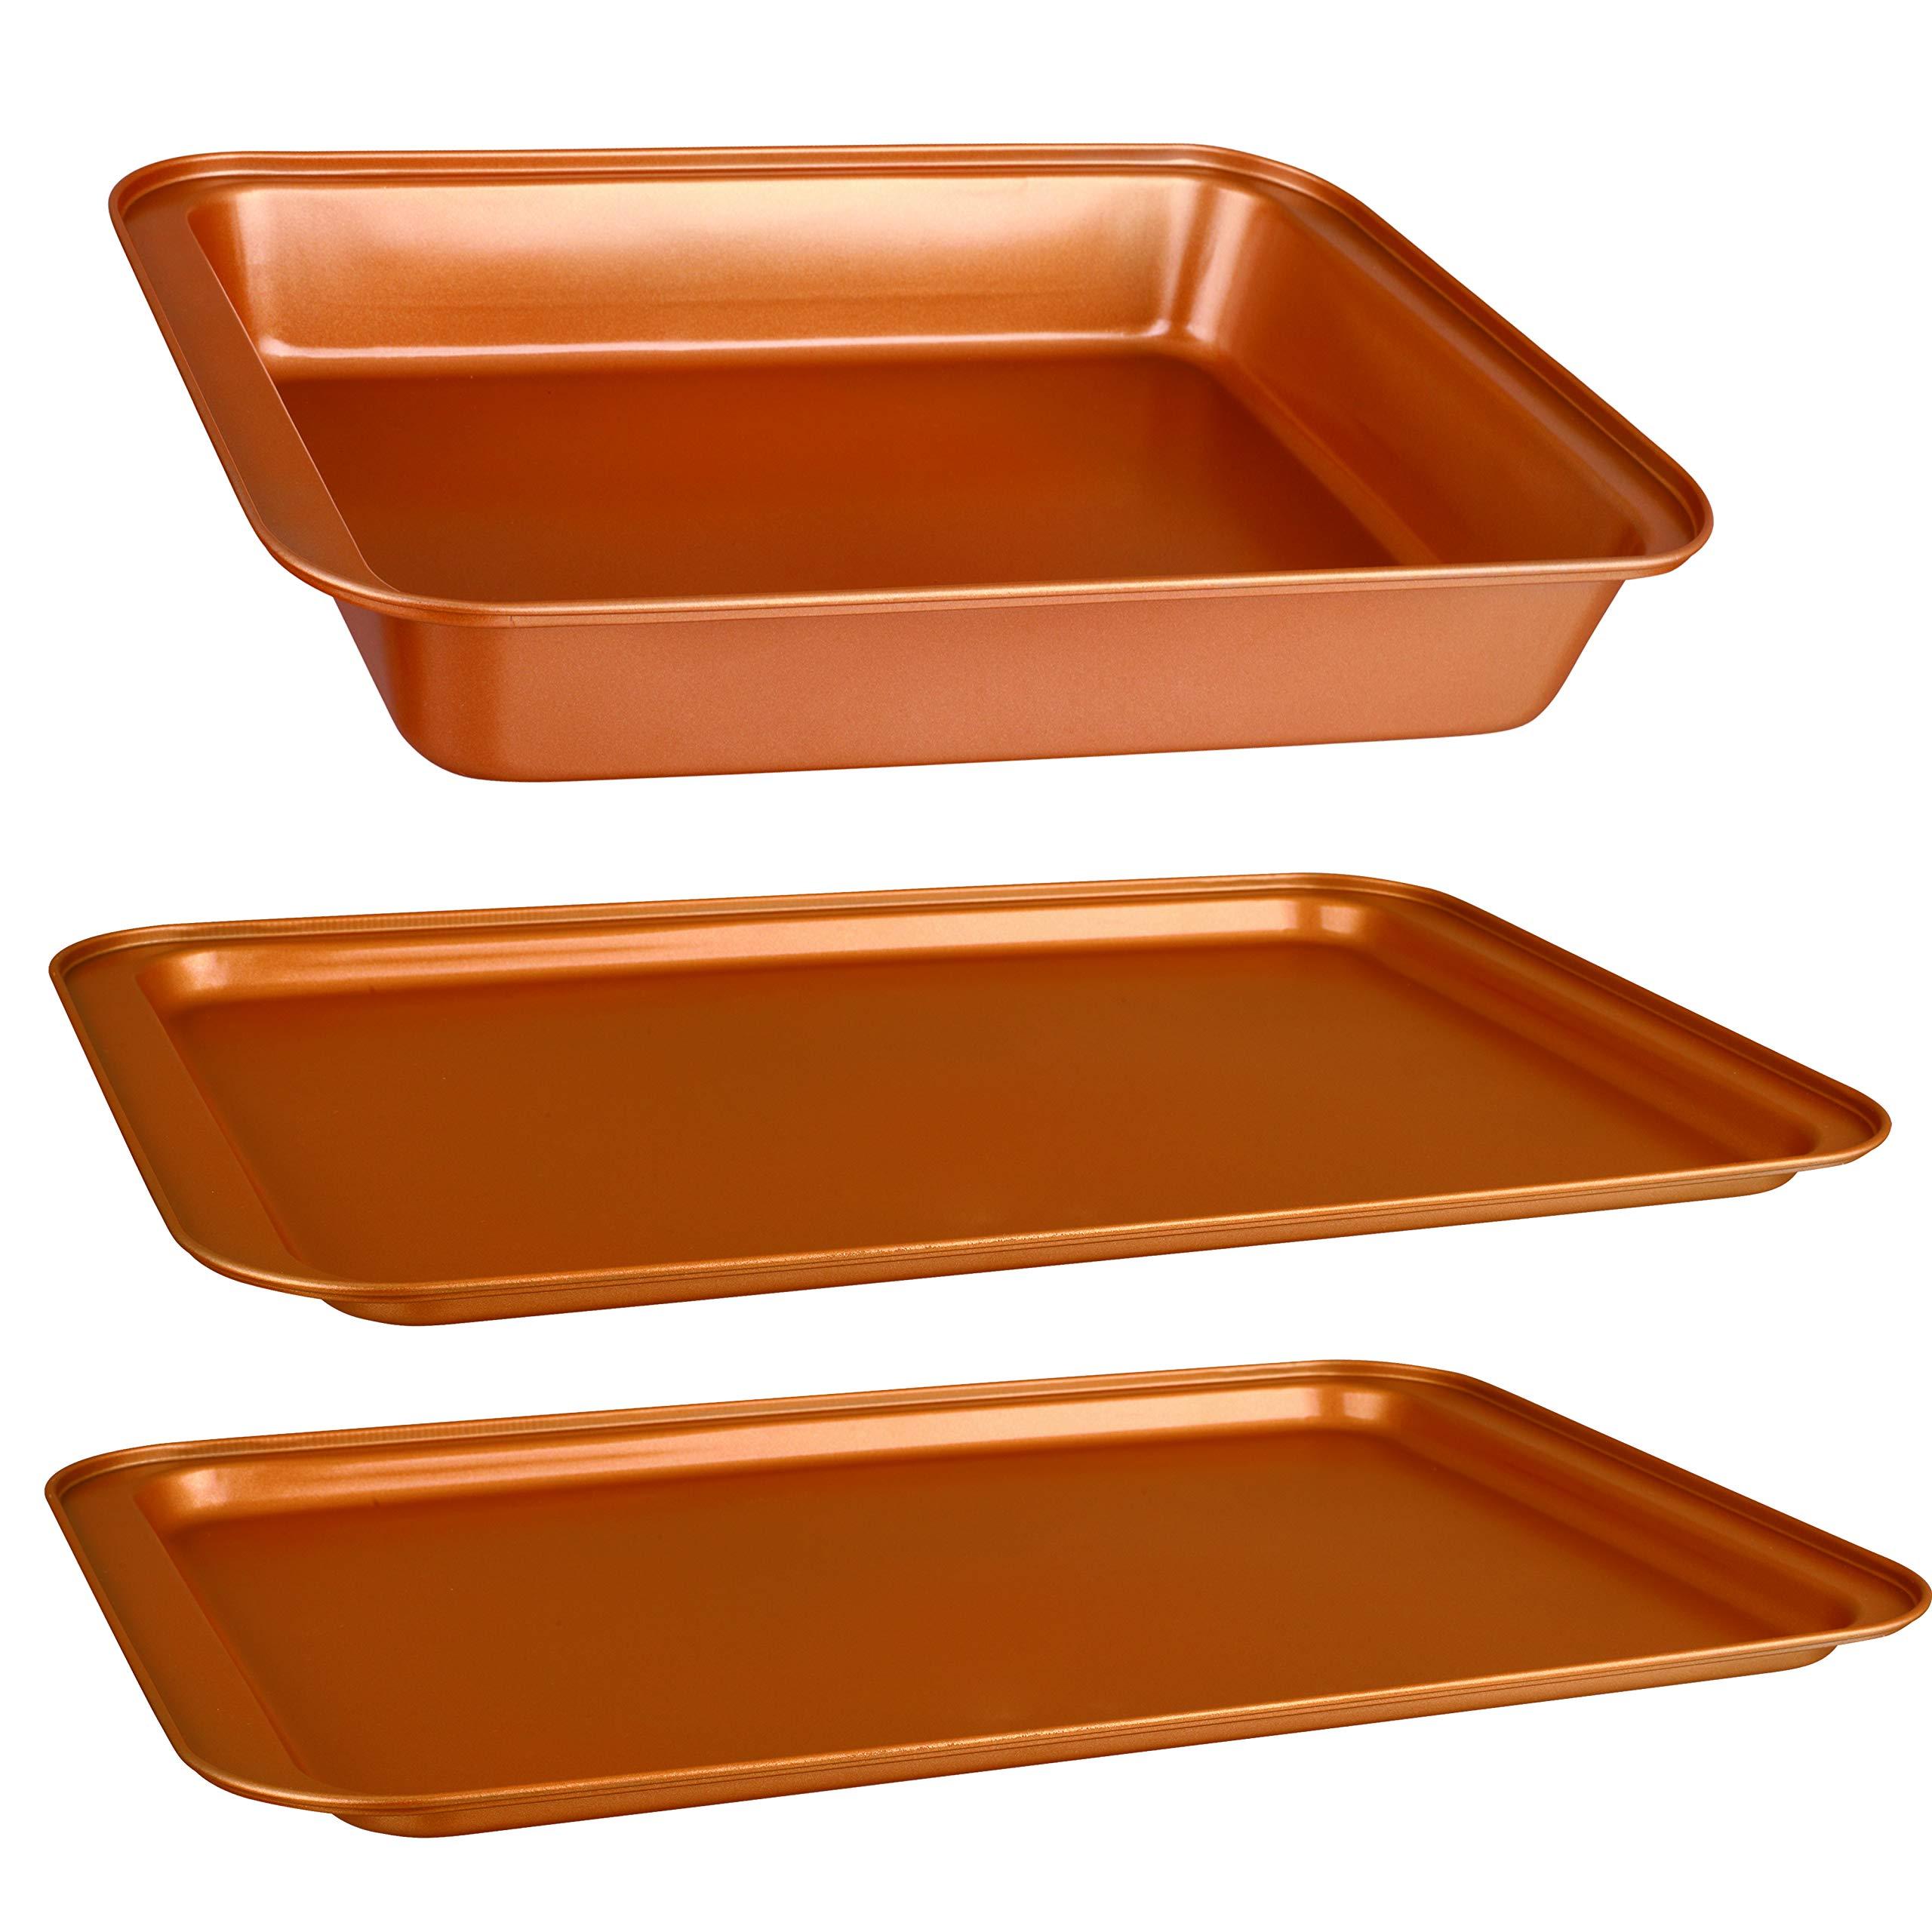 CopperKitchen Baking Pans - 3 pcs Toxic Free NONSTICK - Organic Environmental Friendly Premium Coating - Durable Quality - Rectangle Pan, Cookie Sheet - BAKEWARE SET (3) by CopperKitchenUSA (Image #4)